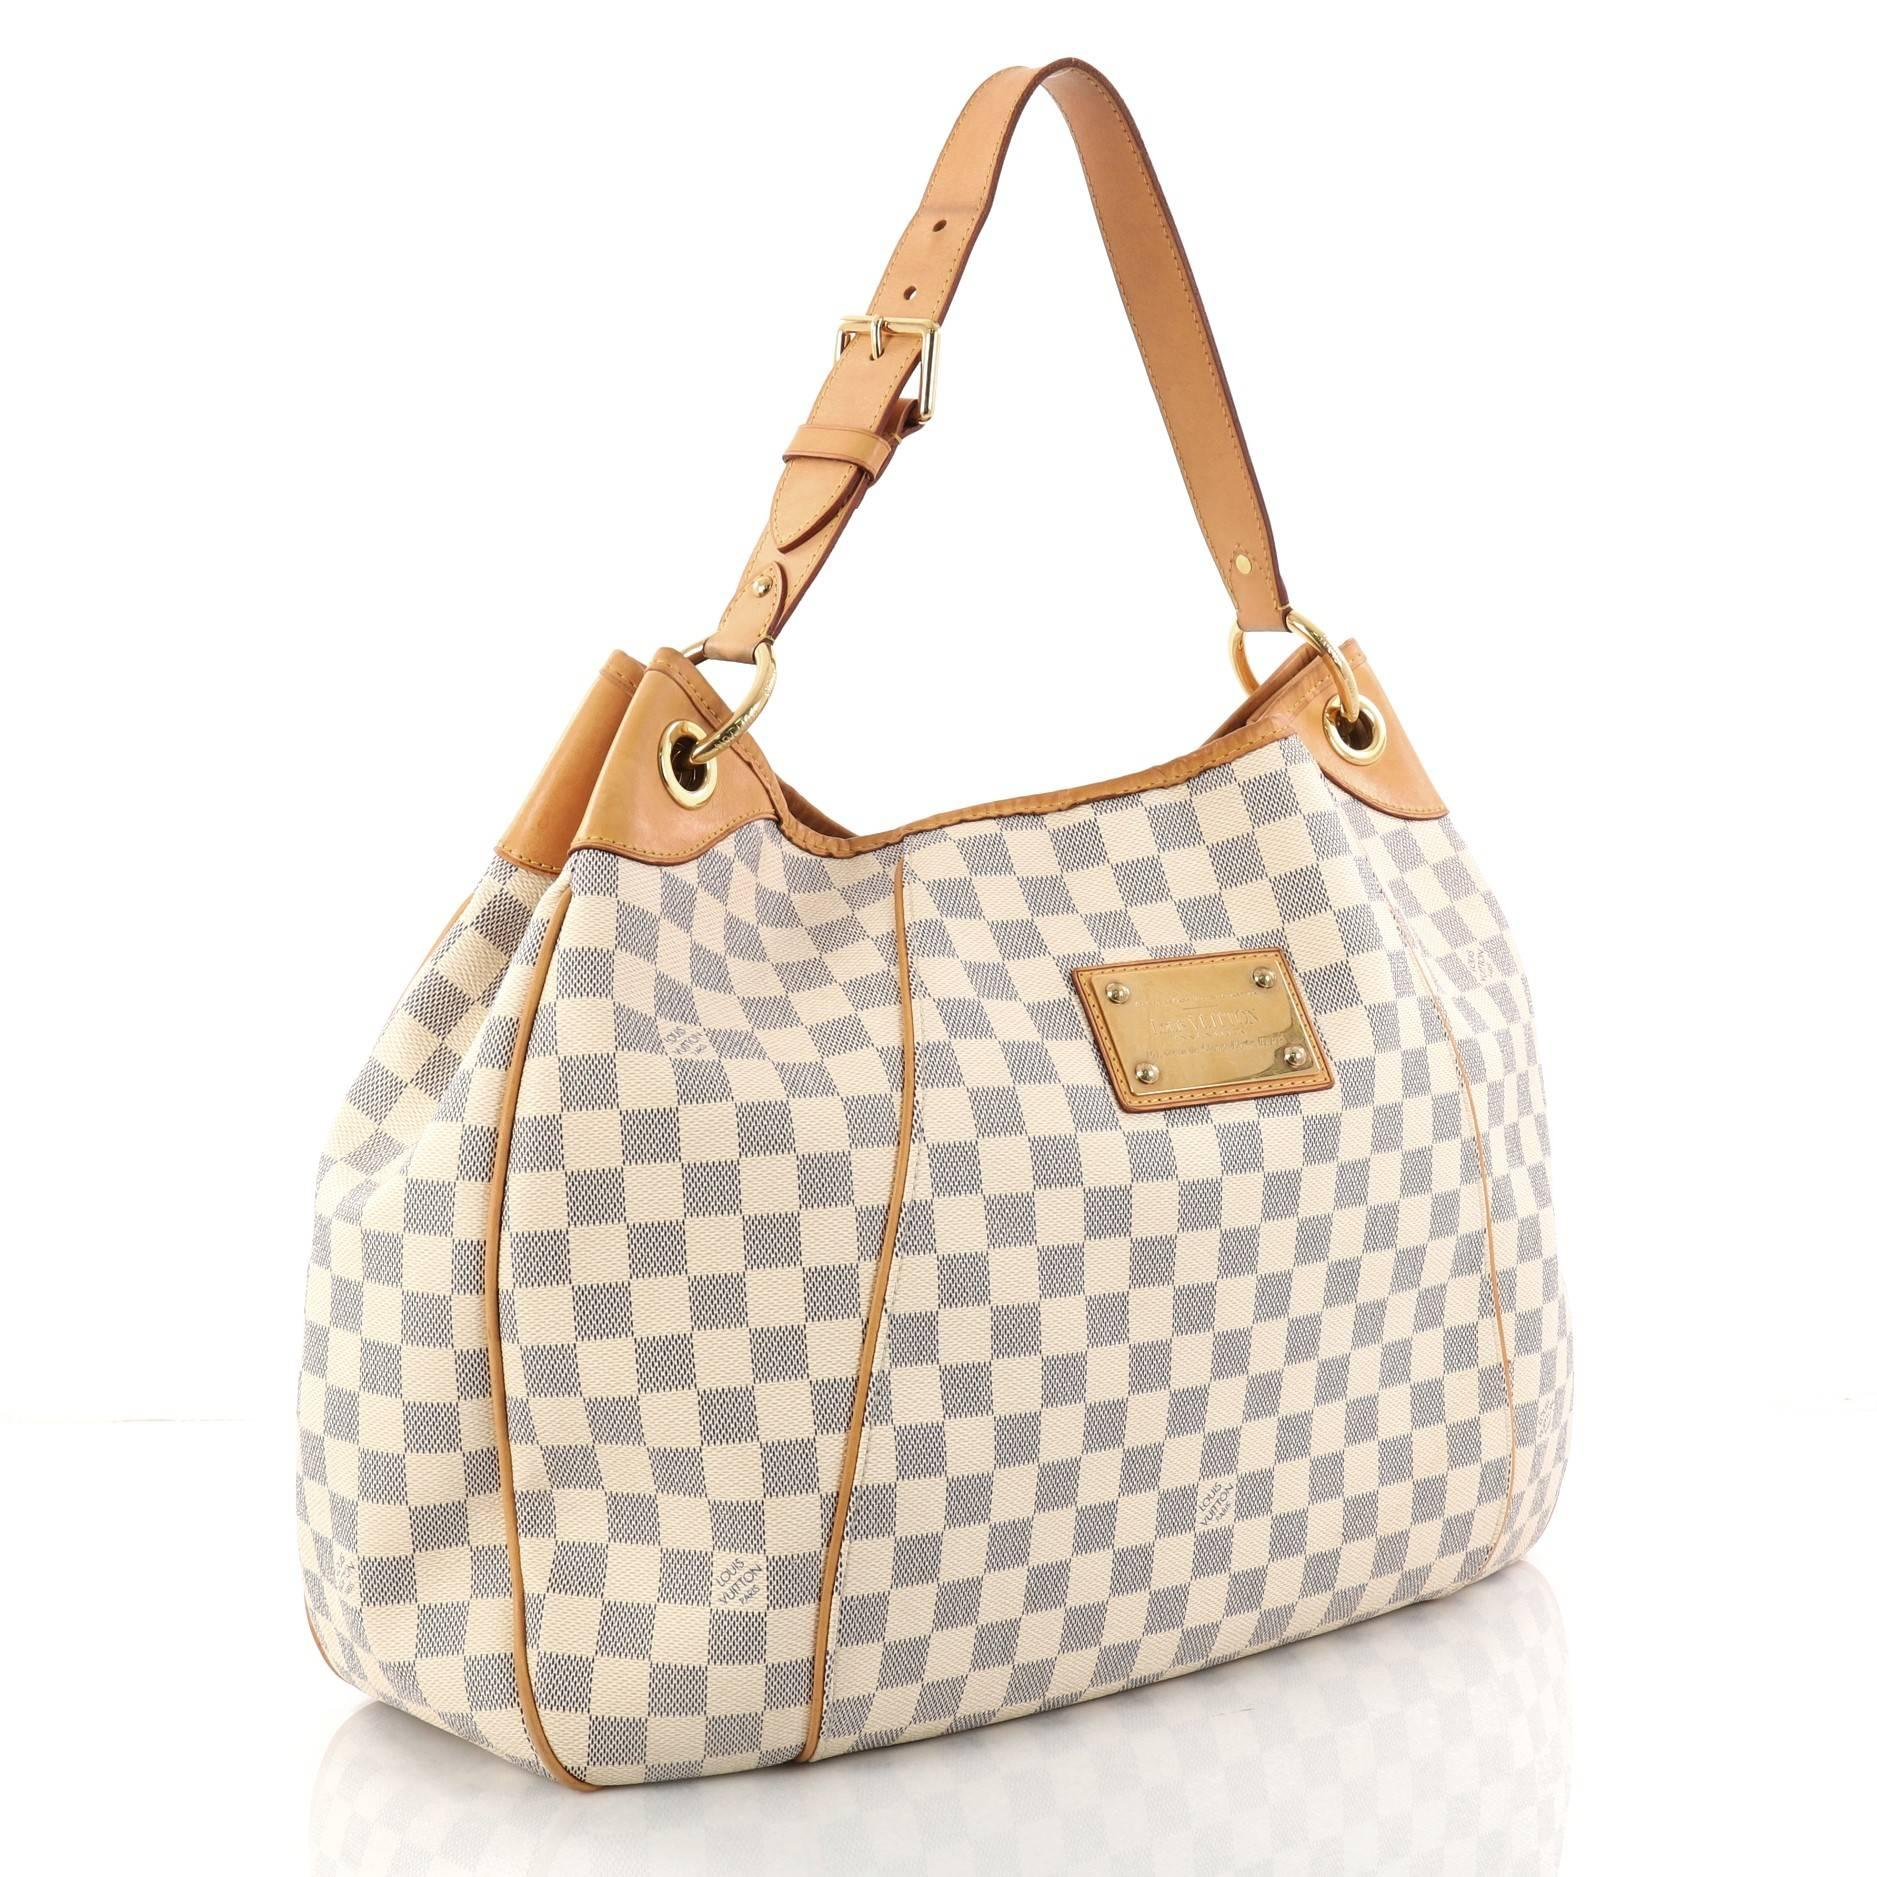 2e73232495 Louis Vuitton Galliera Handbag Damier GM at 1stdibs